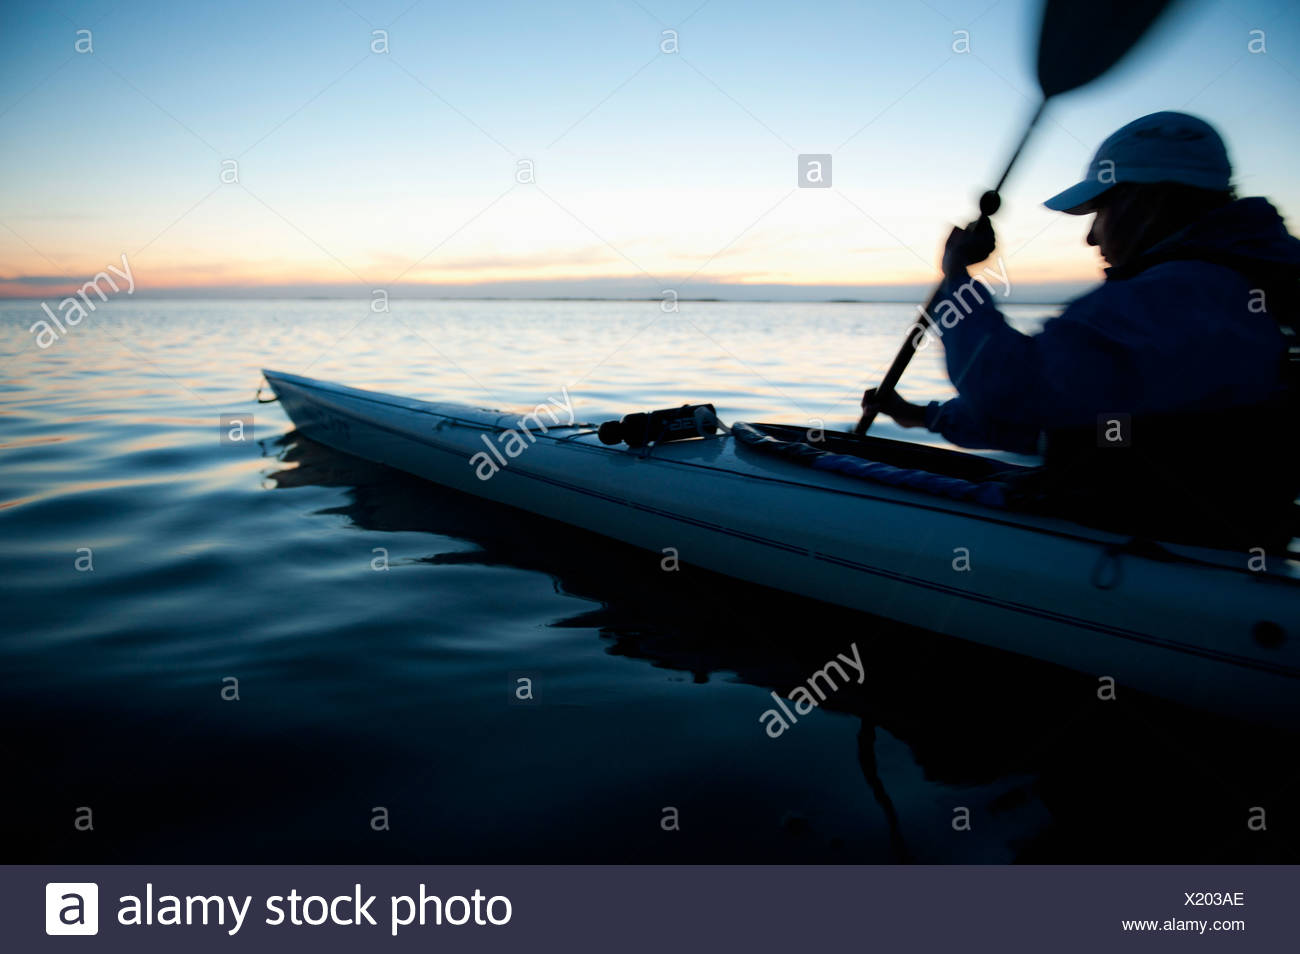 Person in nautical vessel oaring - Stock Image